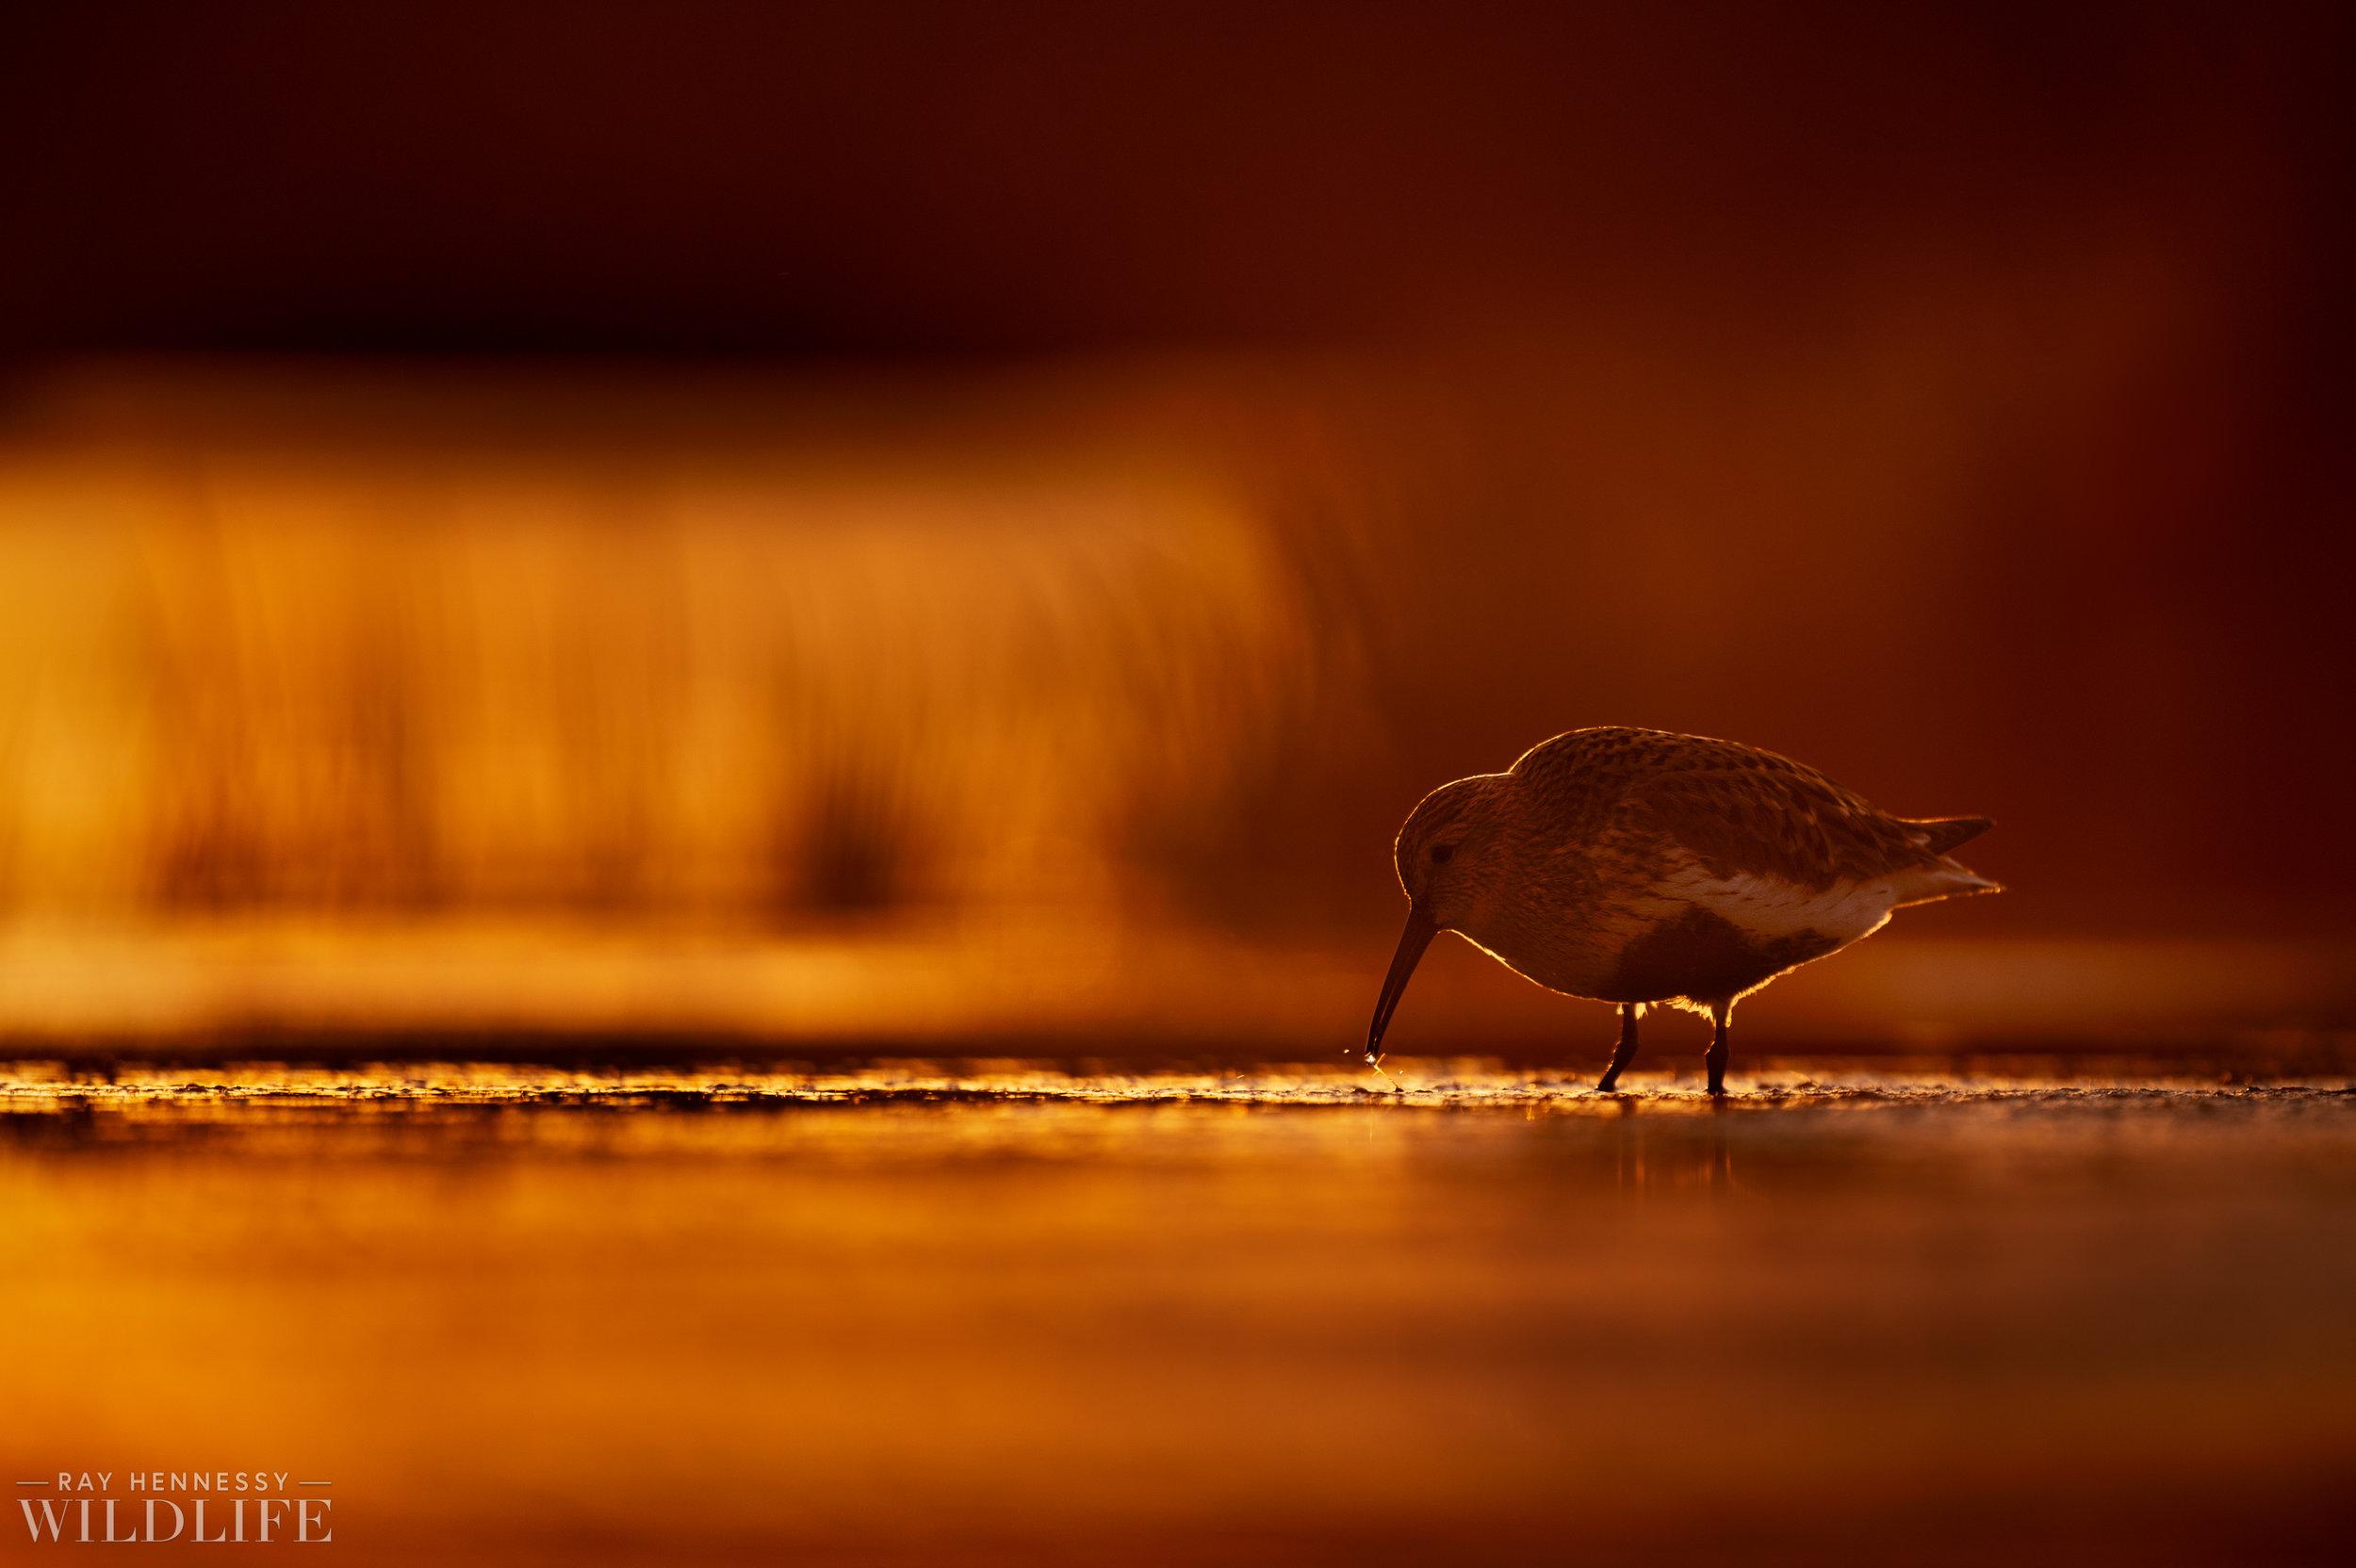 003_shorebirds-prothonotary-warbler.jpg